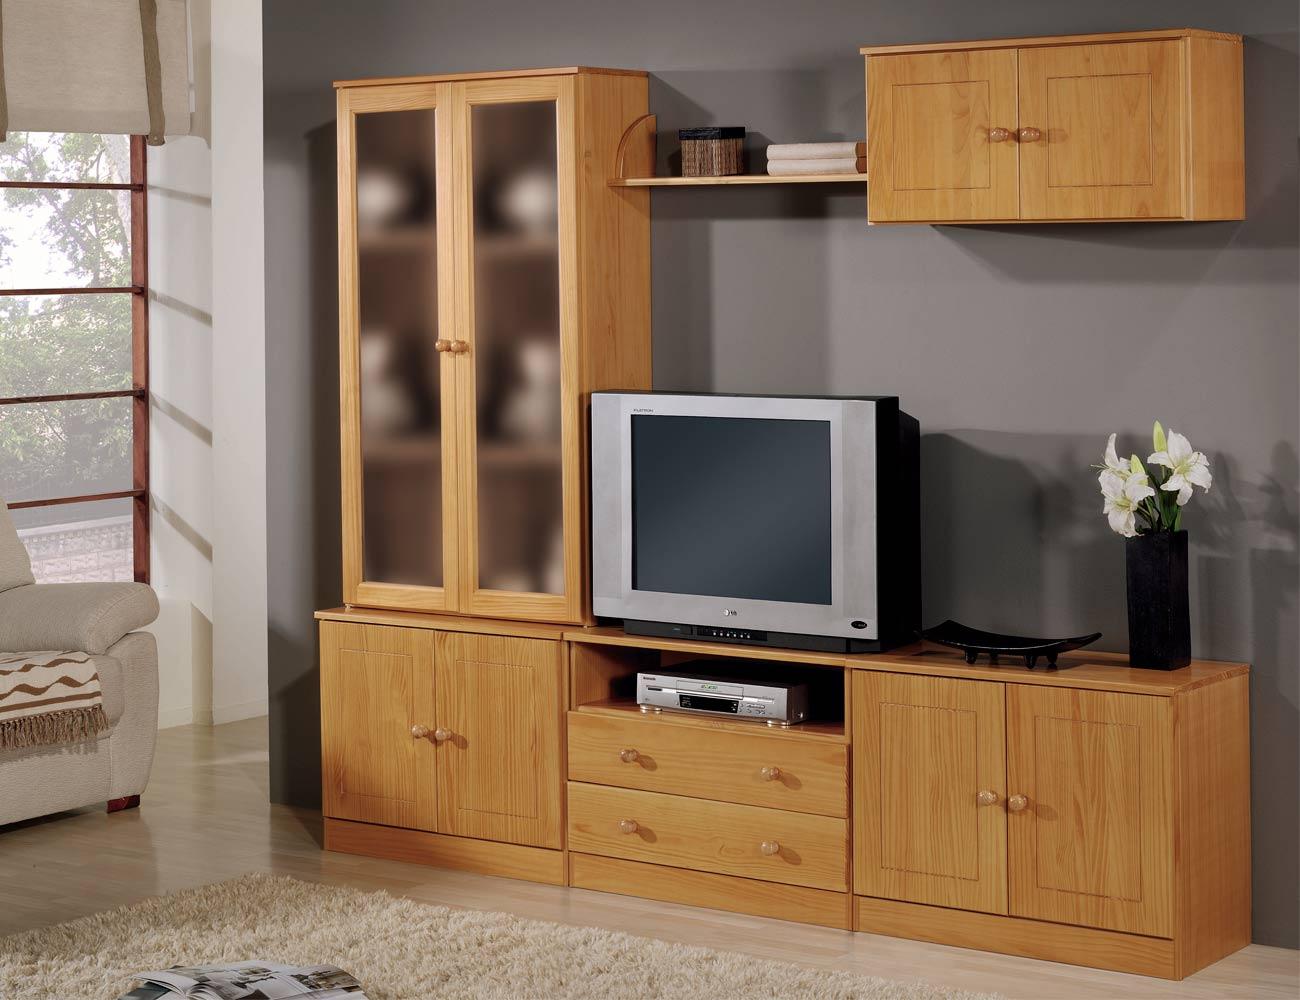 Composicion apilable 1 muebles provenzal madera pino